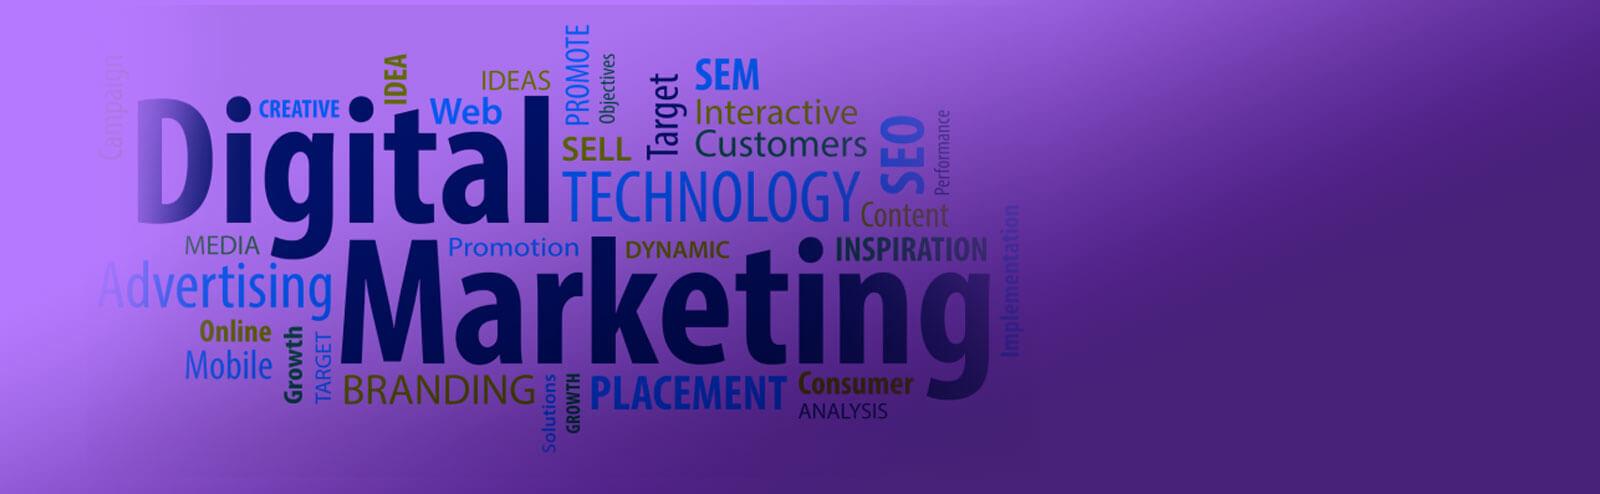 Digital Marketing Agency Los Angeles Banner